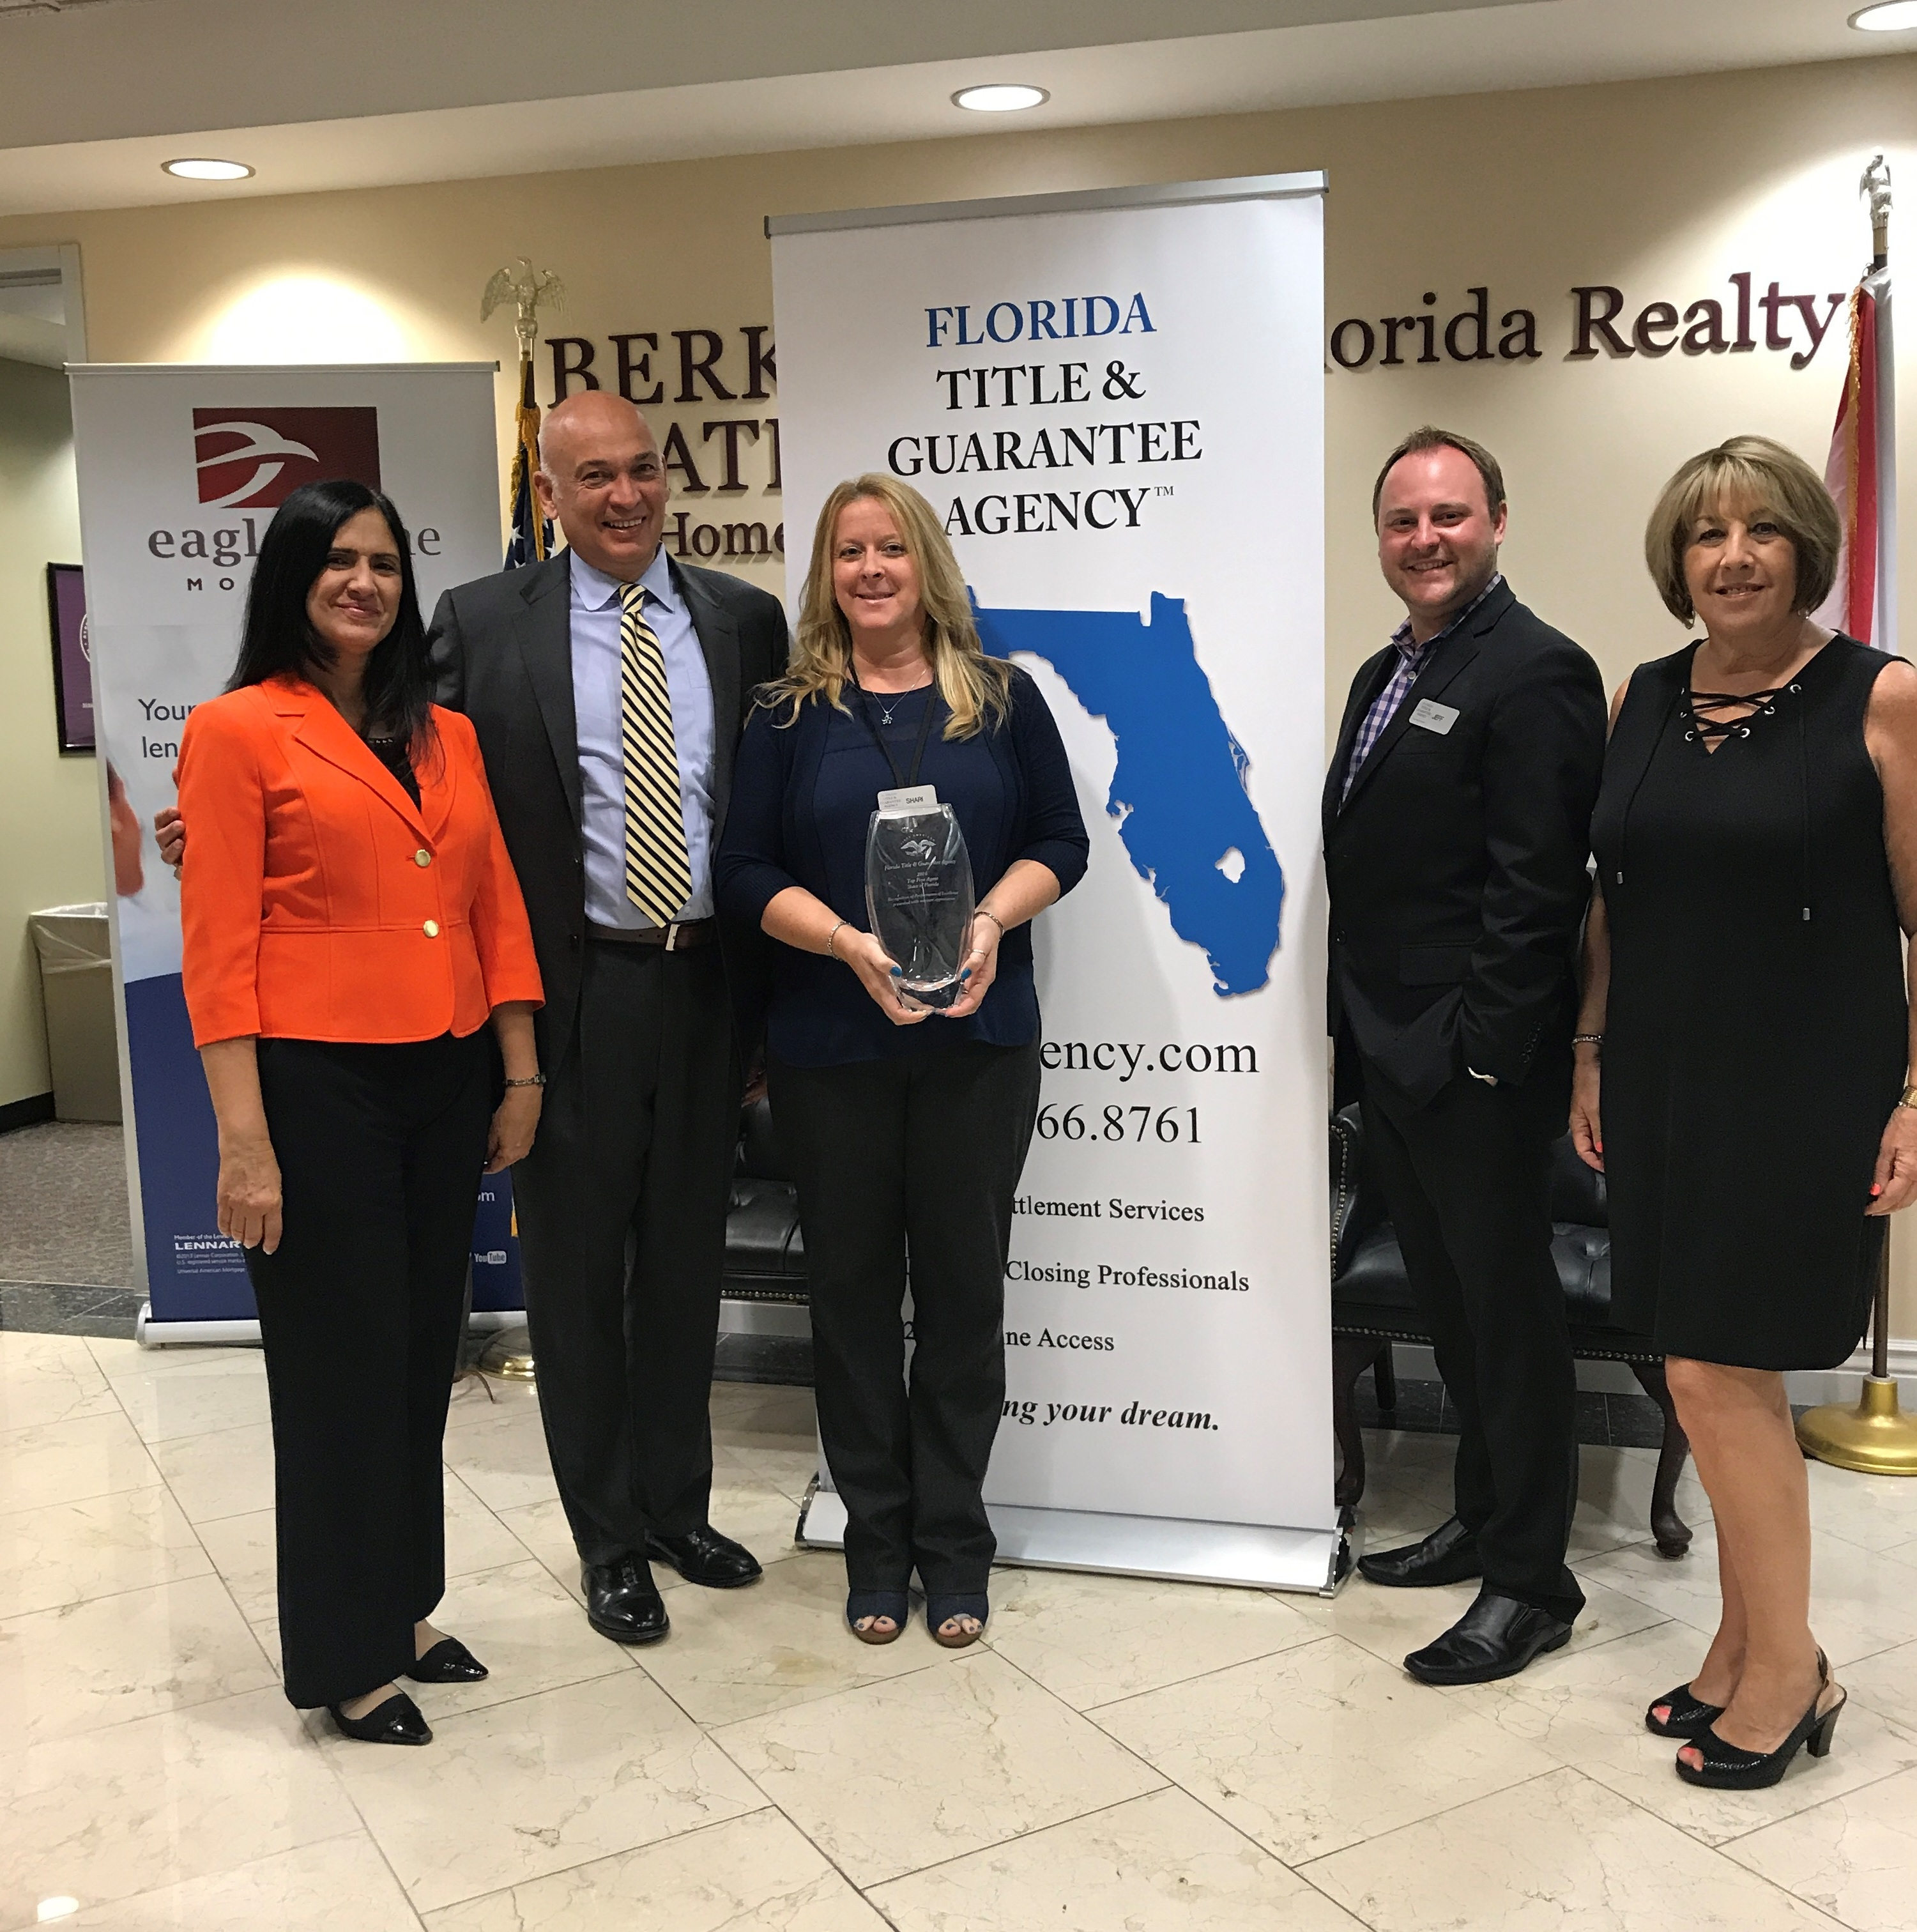 Florida Title & Guarantee Agency Receives Top 5 Award from ...